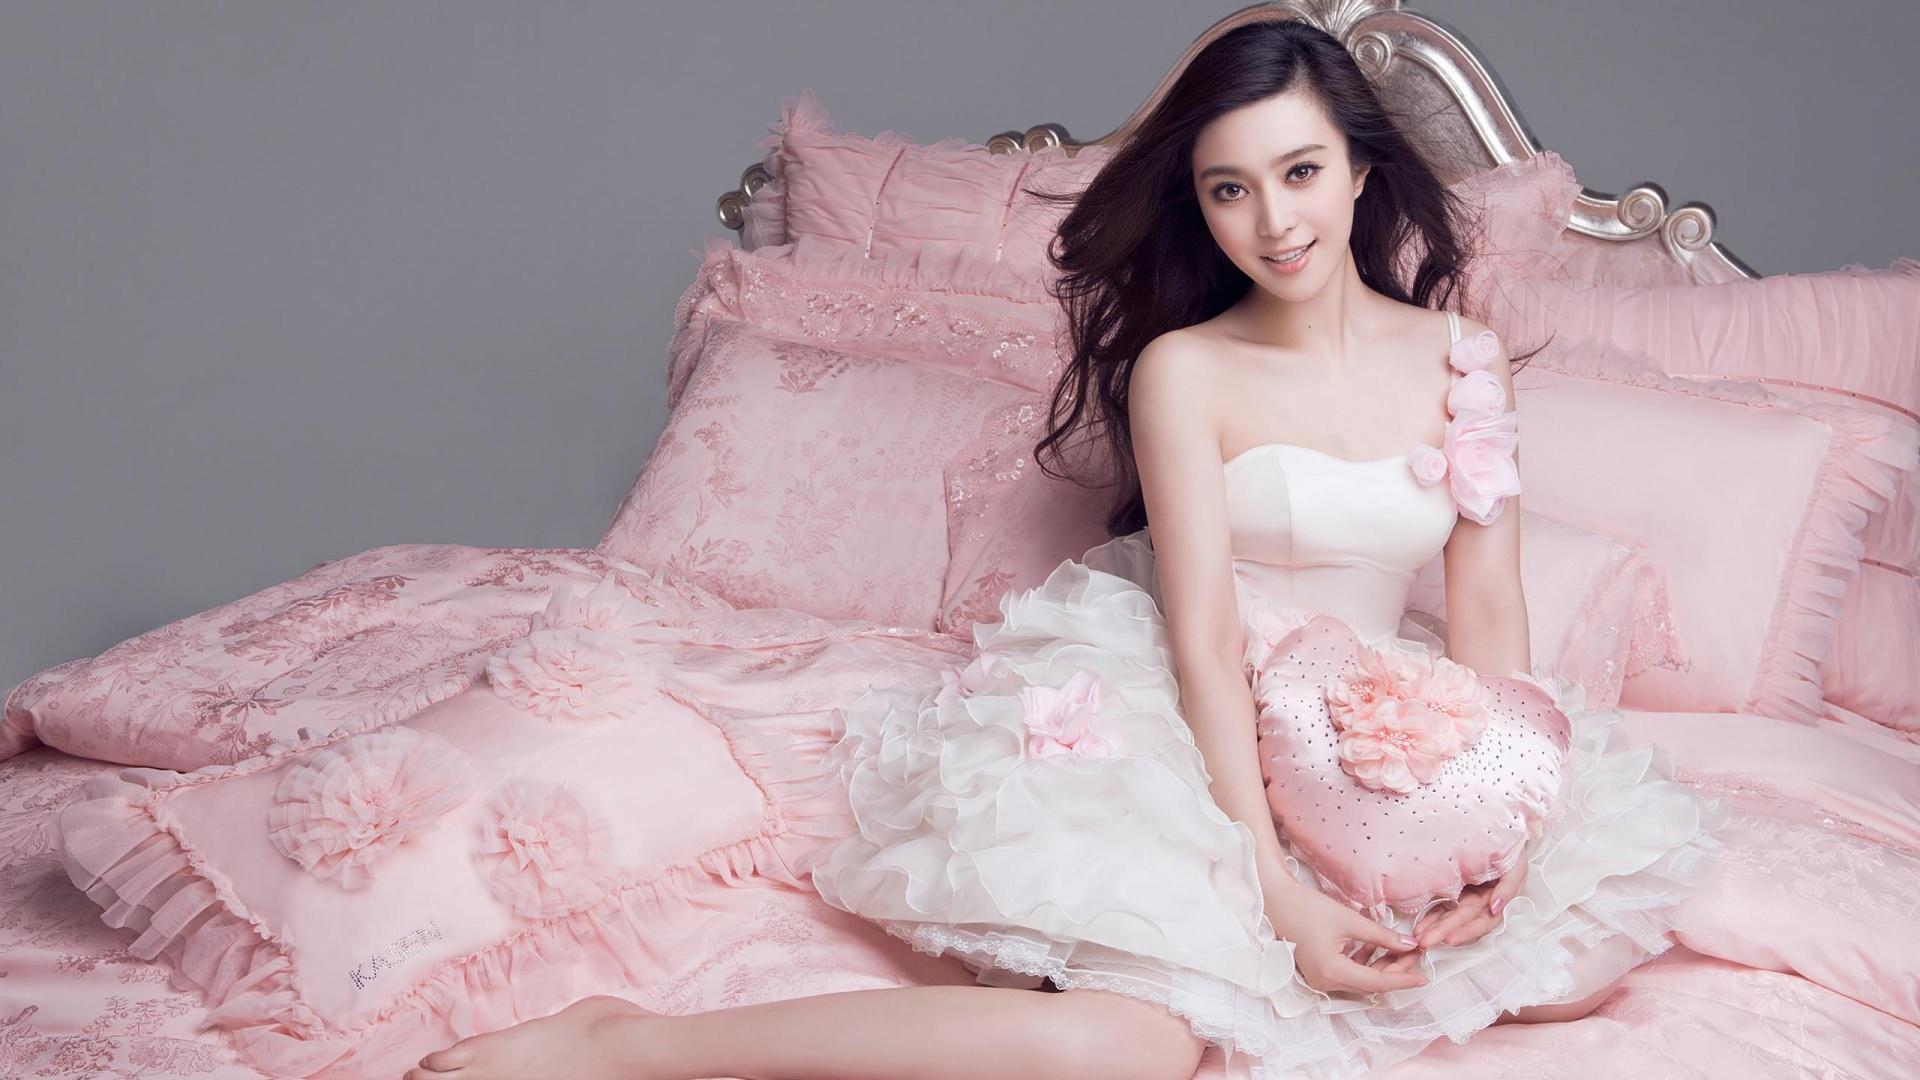 Pretty Asian Girl Wallpaper HD